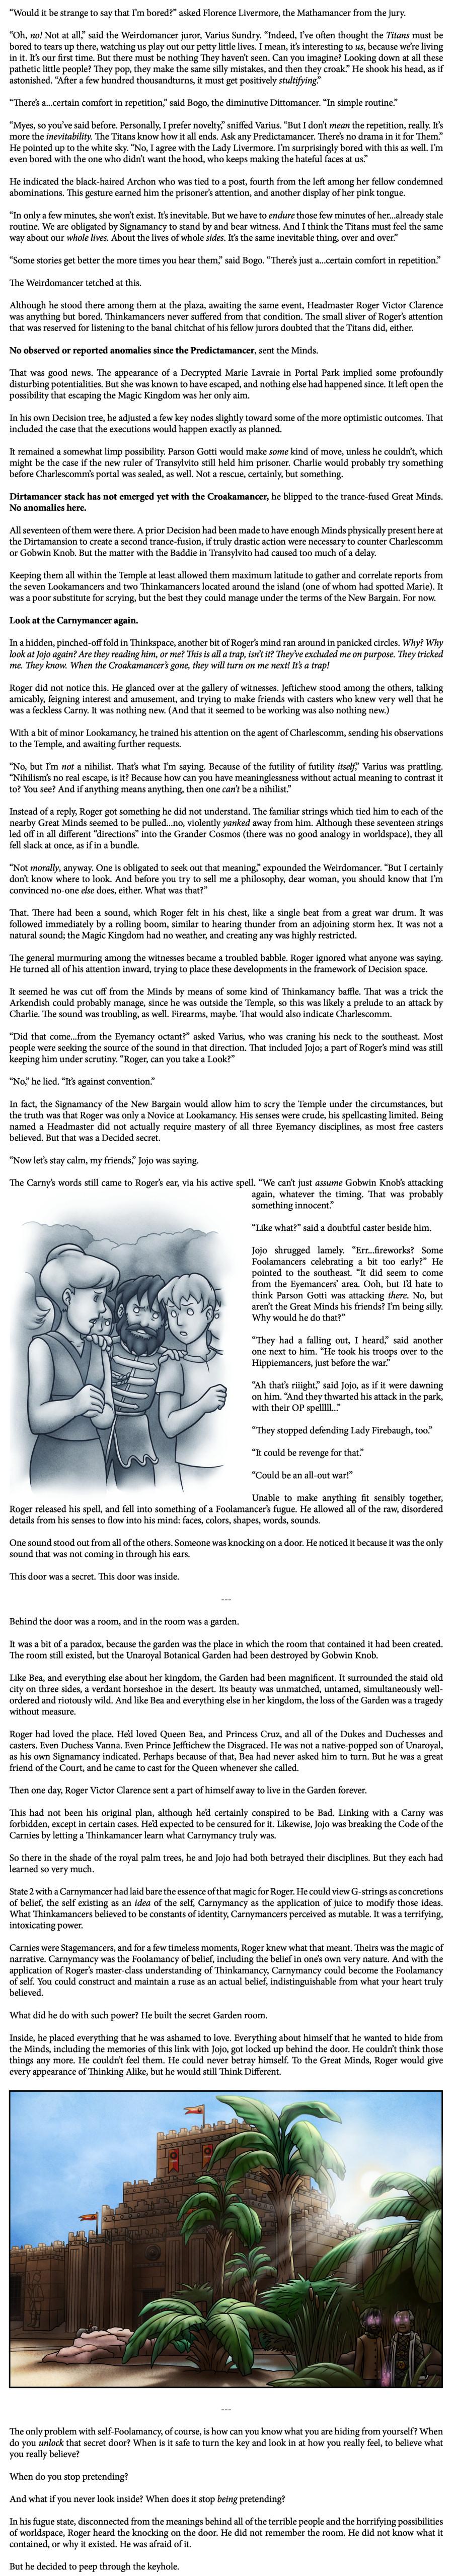 Comic - Book 4 - Page 104